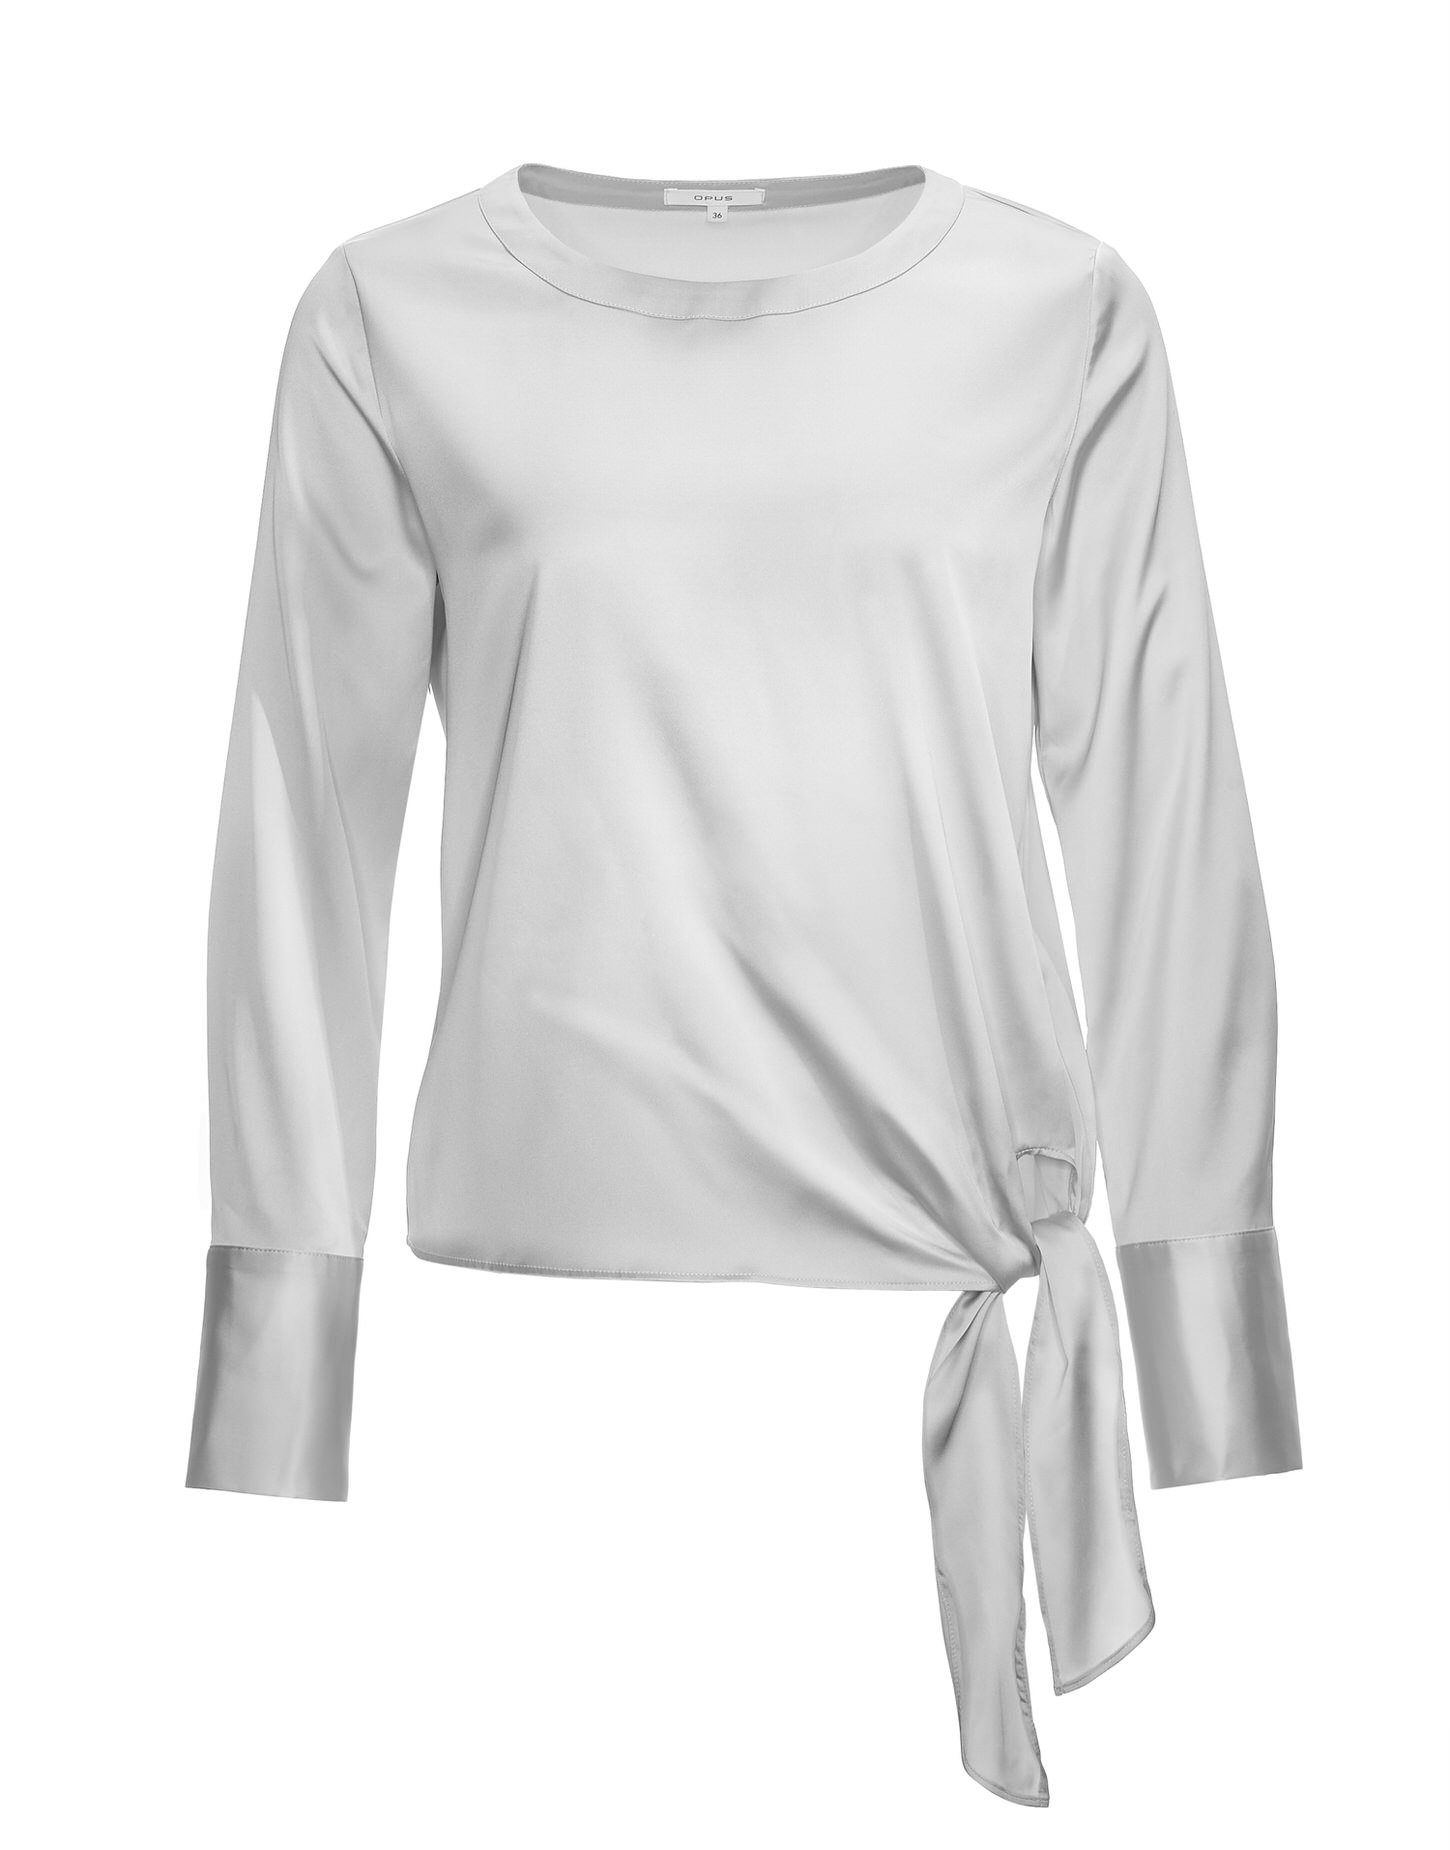 Grijze blouse met lange manchetten Opus - Flota Satin 229134952